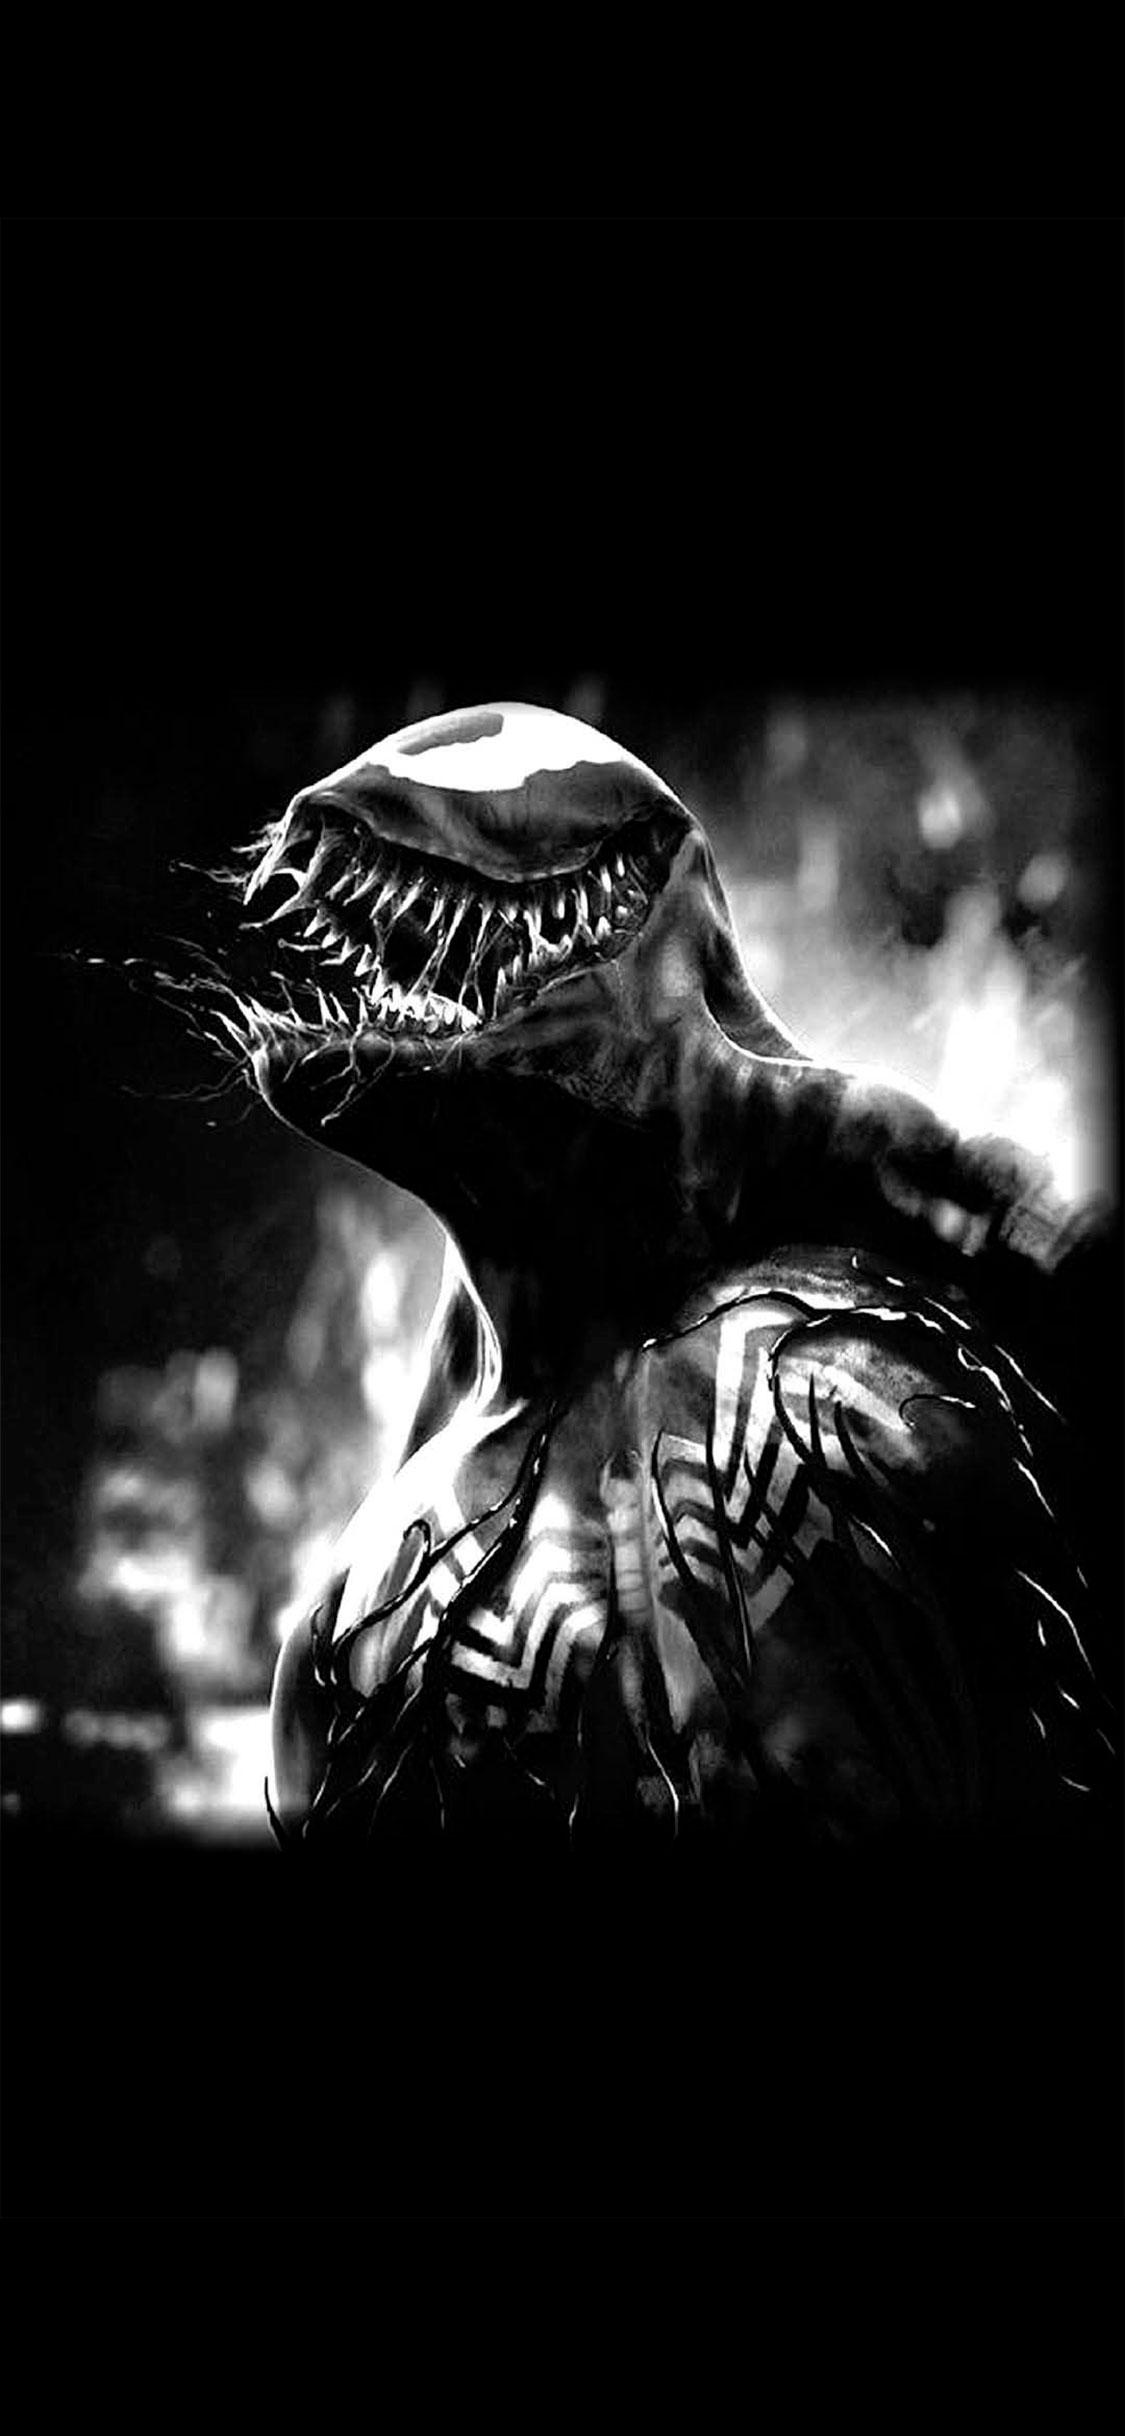 iPhone wallpaper venom1 Venom